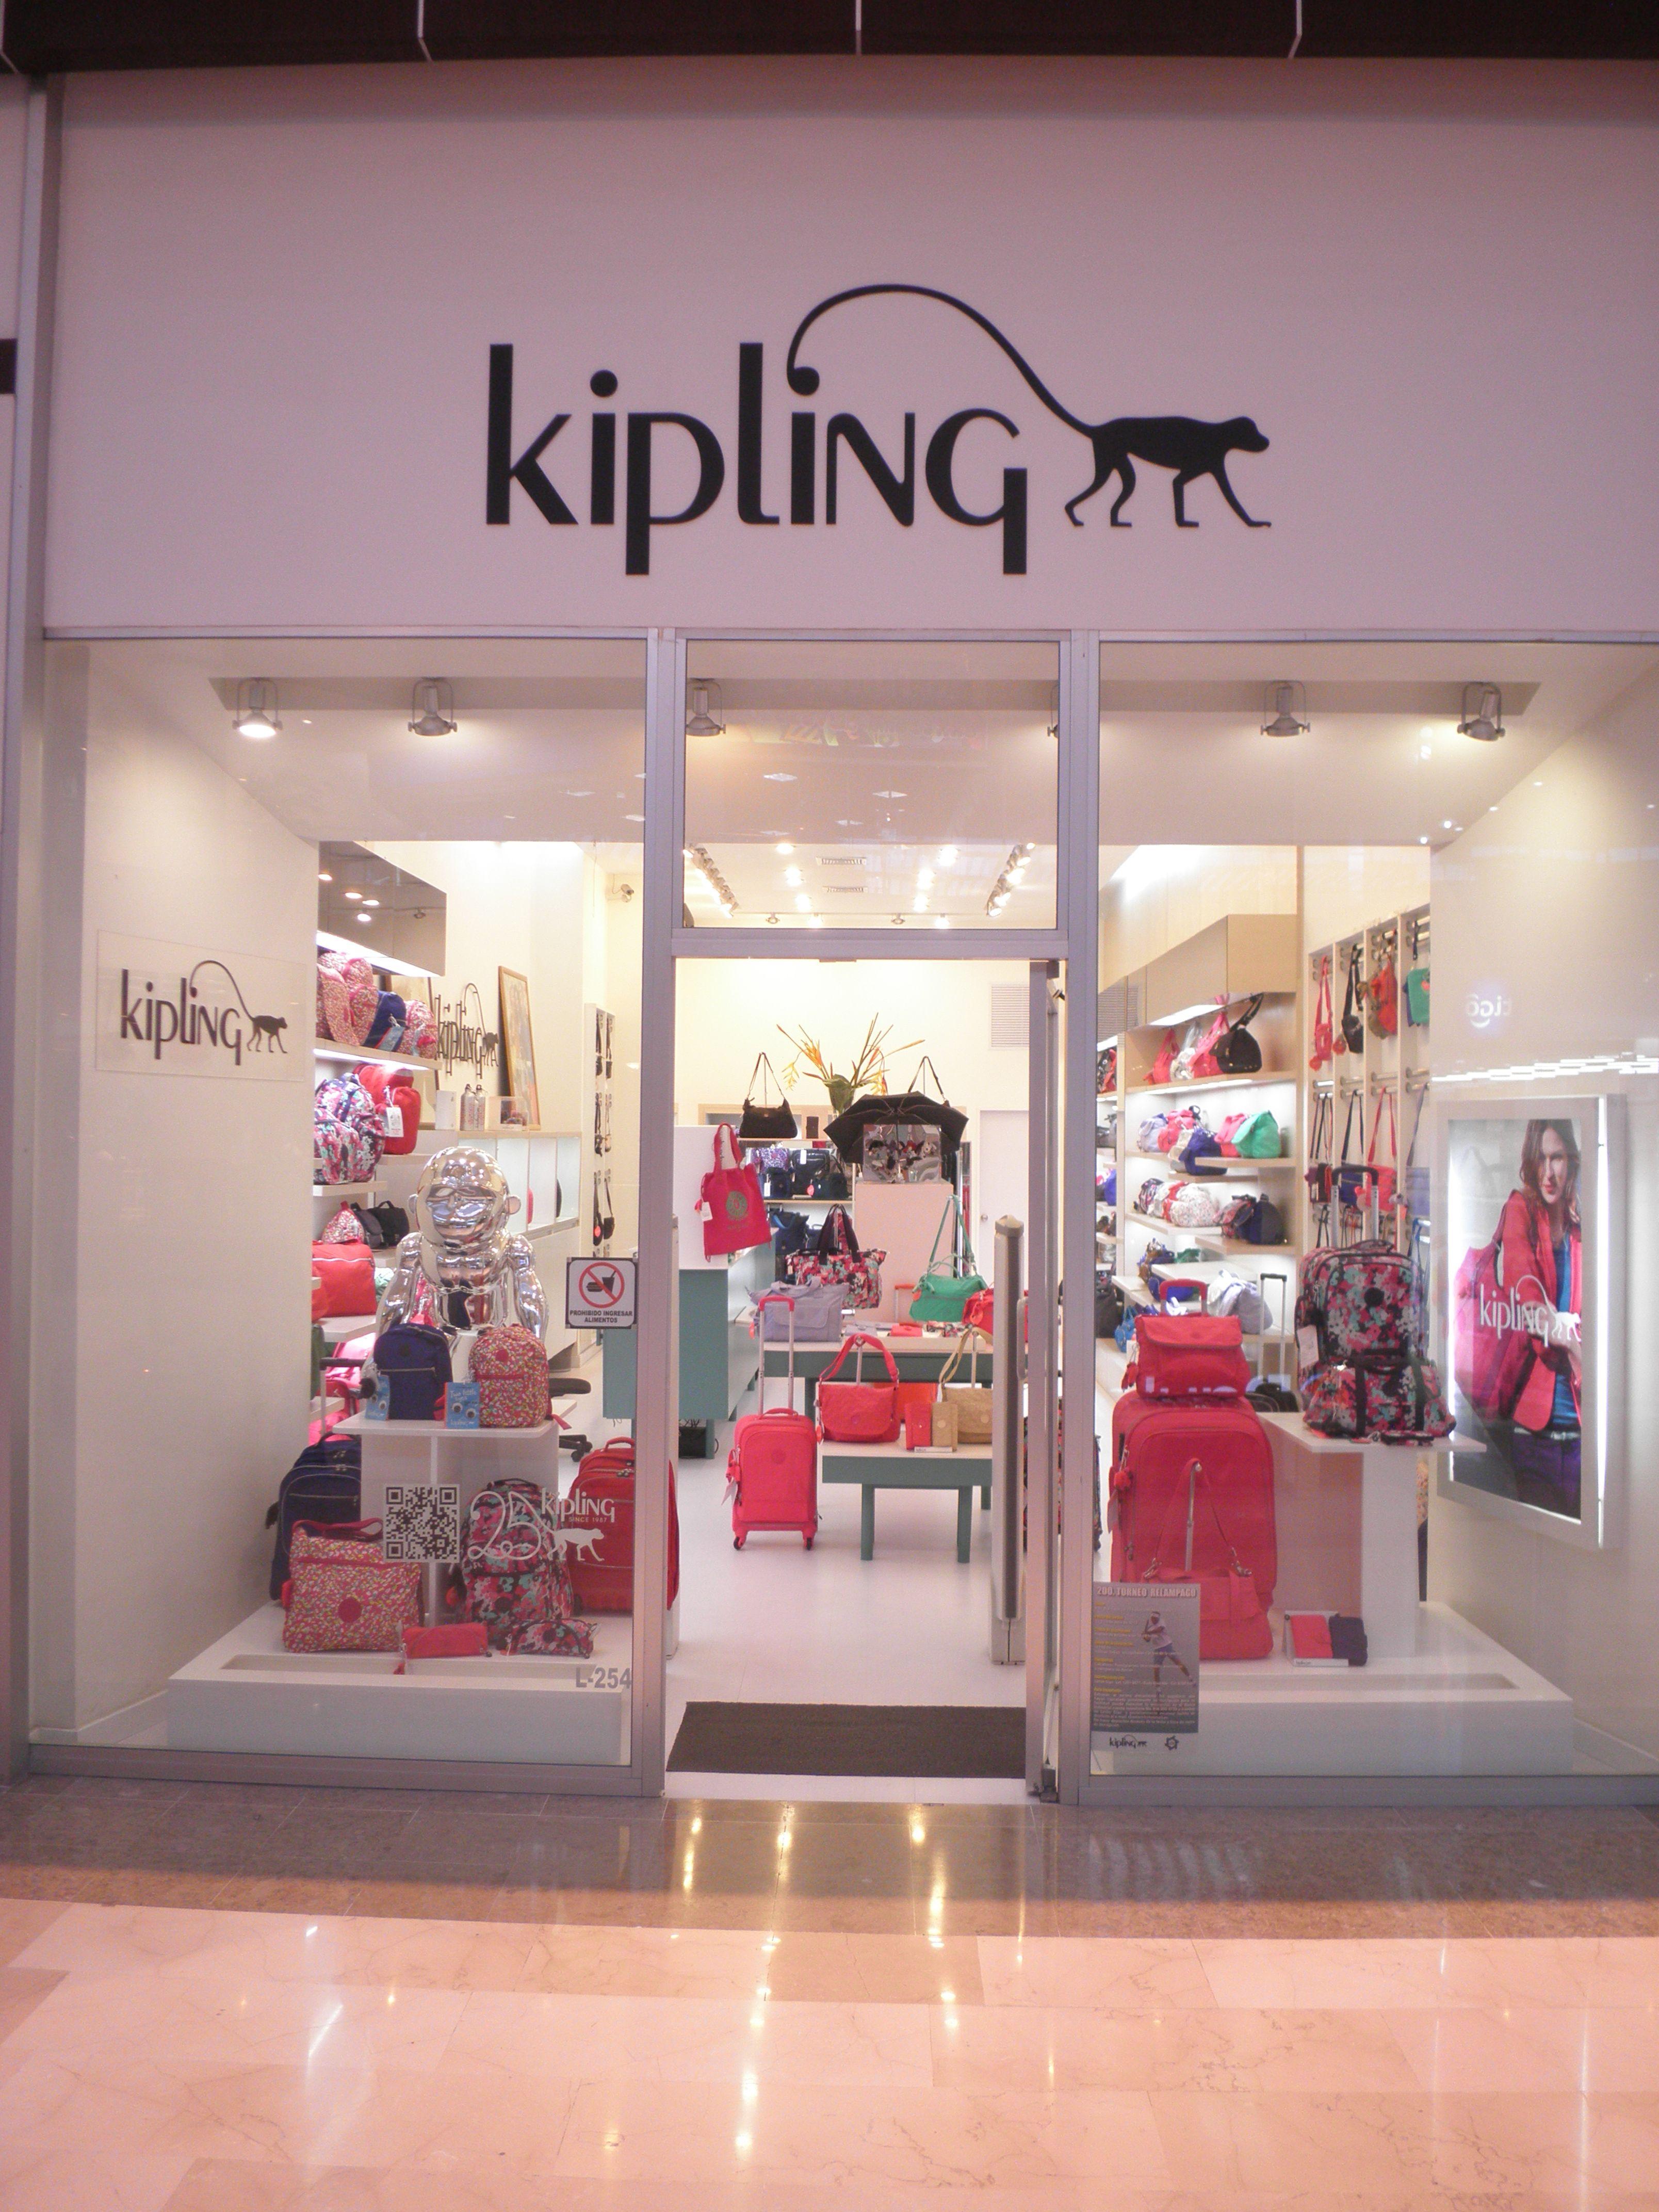 ff5e8ffbd Nuestra tienda #kipling en #Guatemala | Tienda Kipling Guatemala